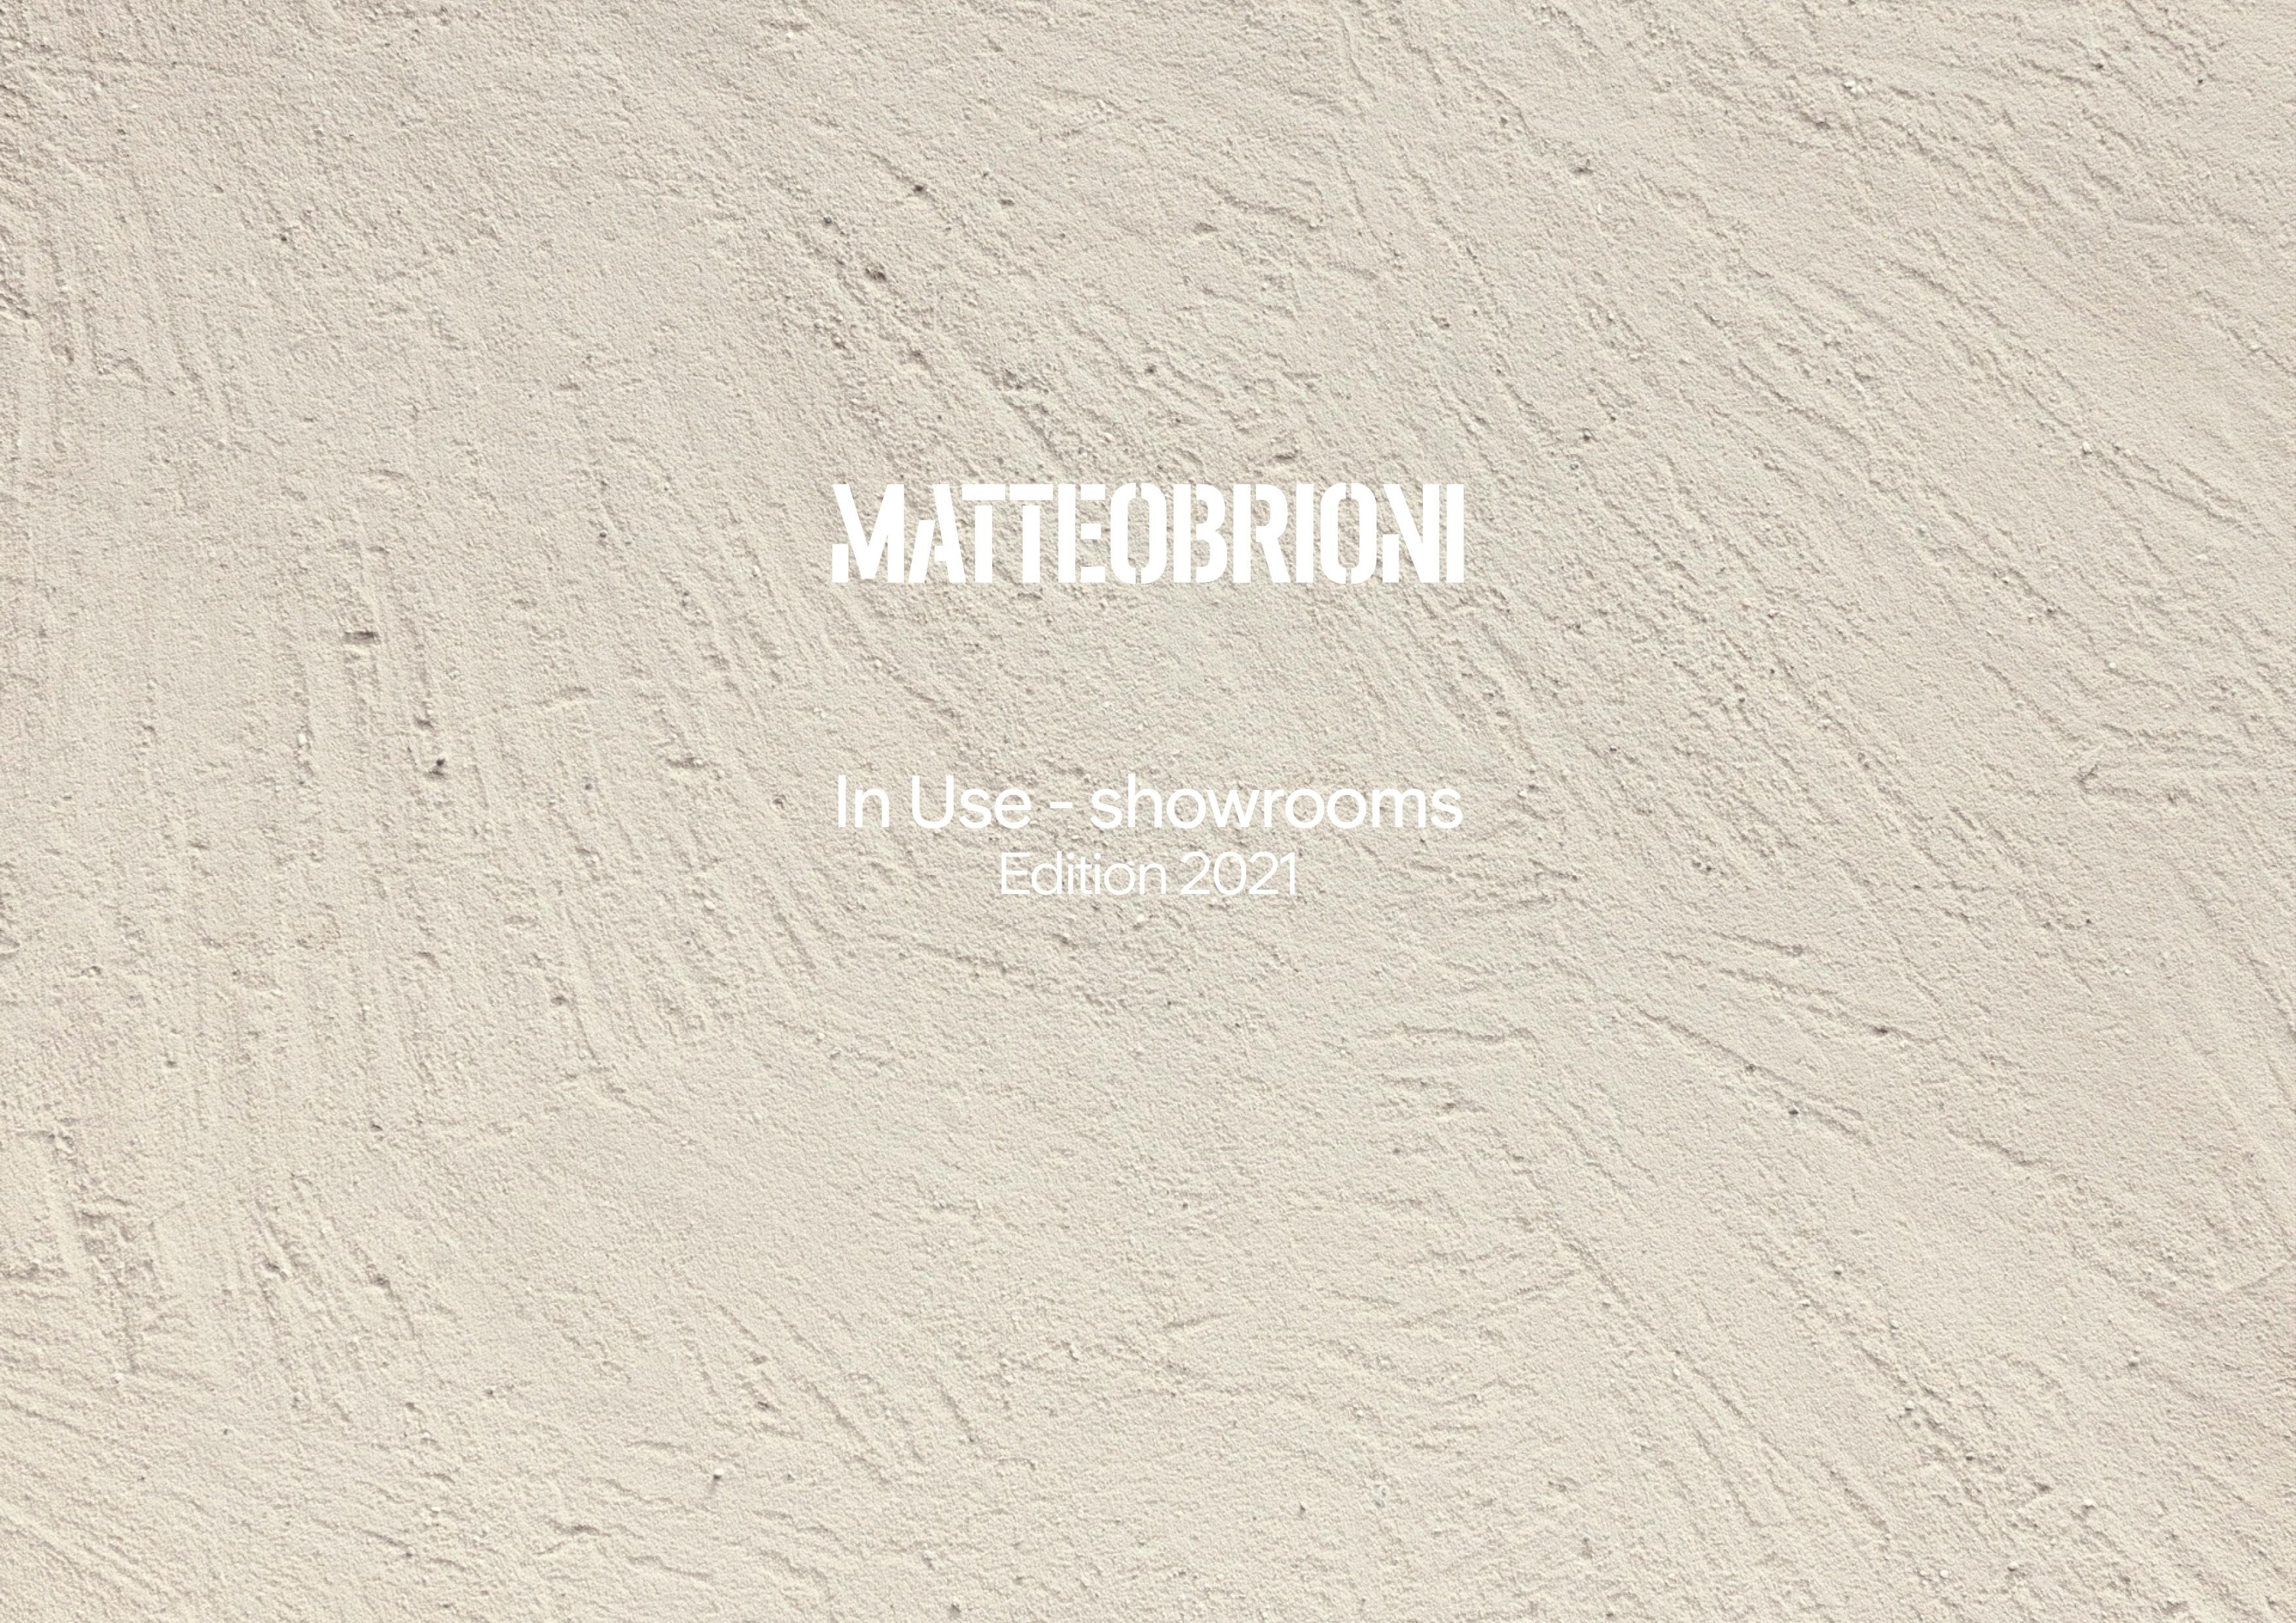 Matteo Brioni In Use 2021 Showrooms presentation English, by Lorenzo Carmassi